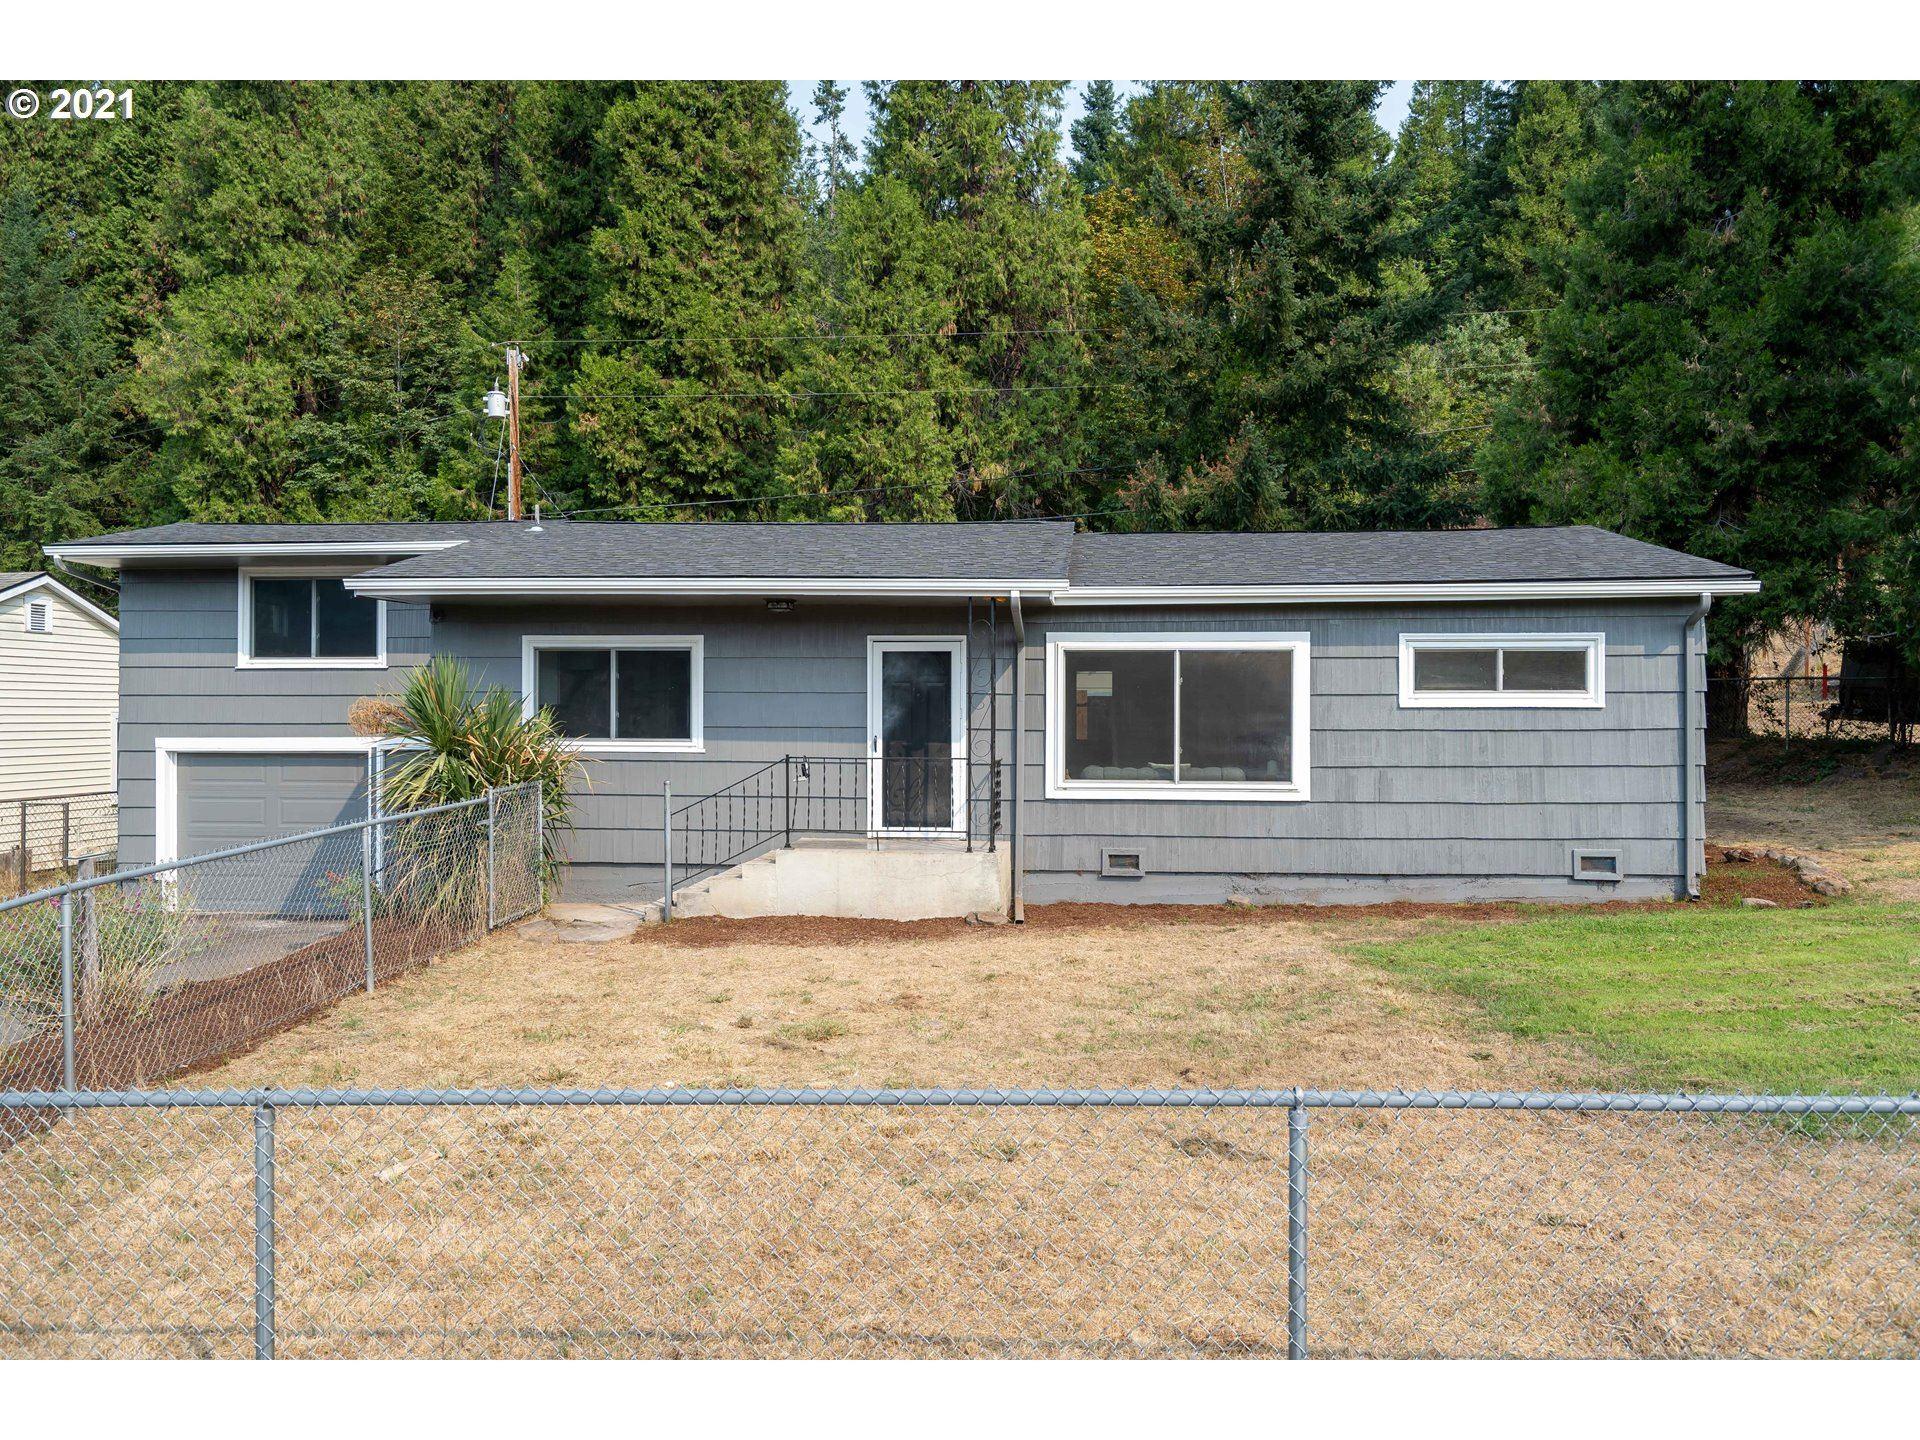 Photo for 48521 E 1ST ST, Oakridge, OR 97463 (MLS # 21401498)